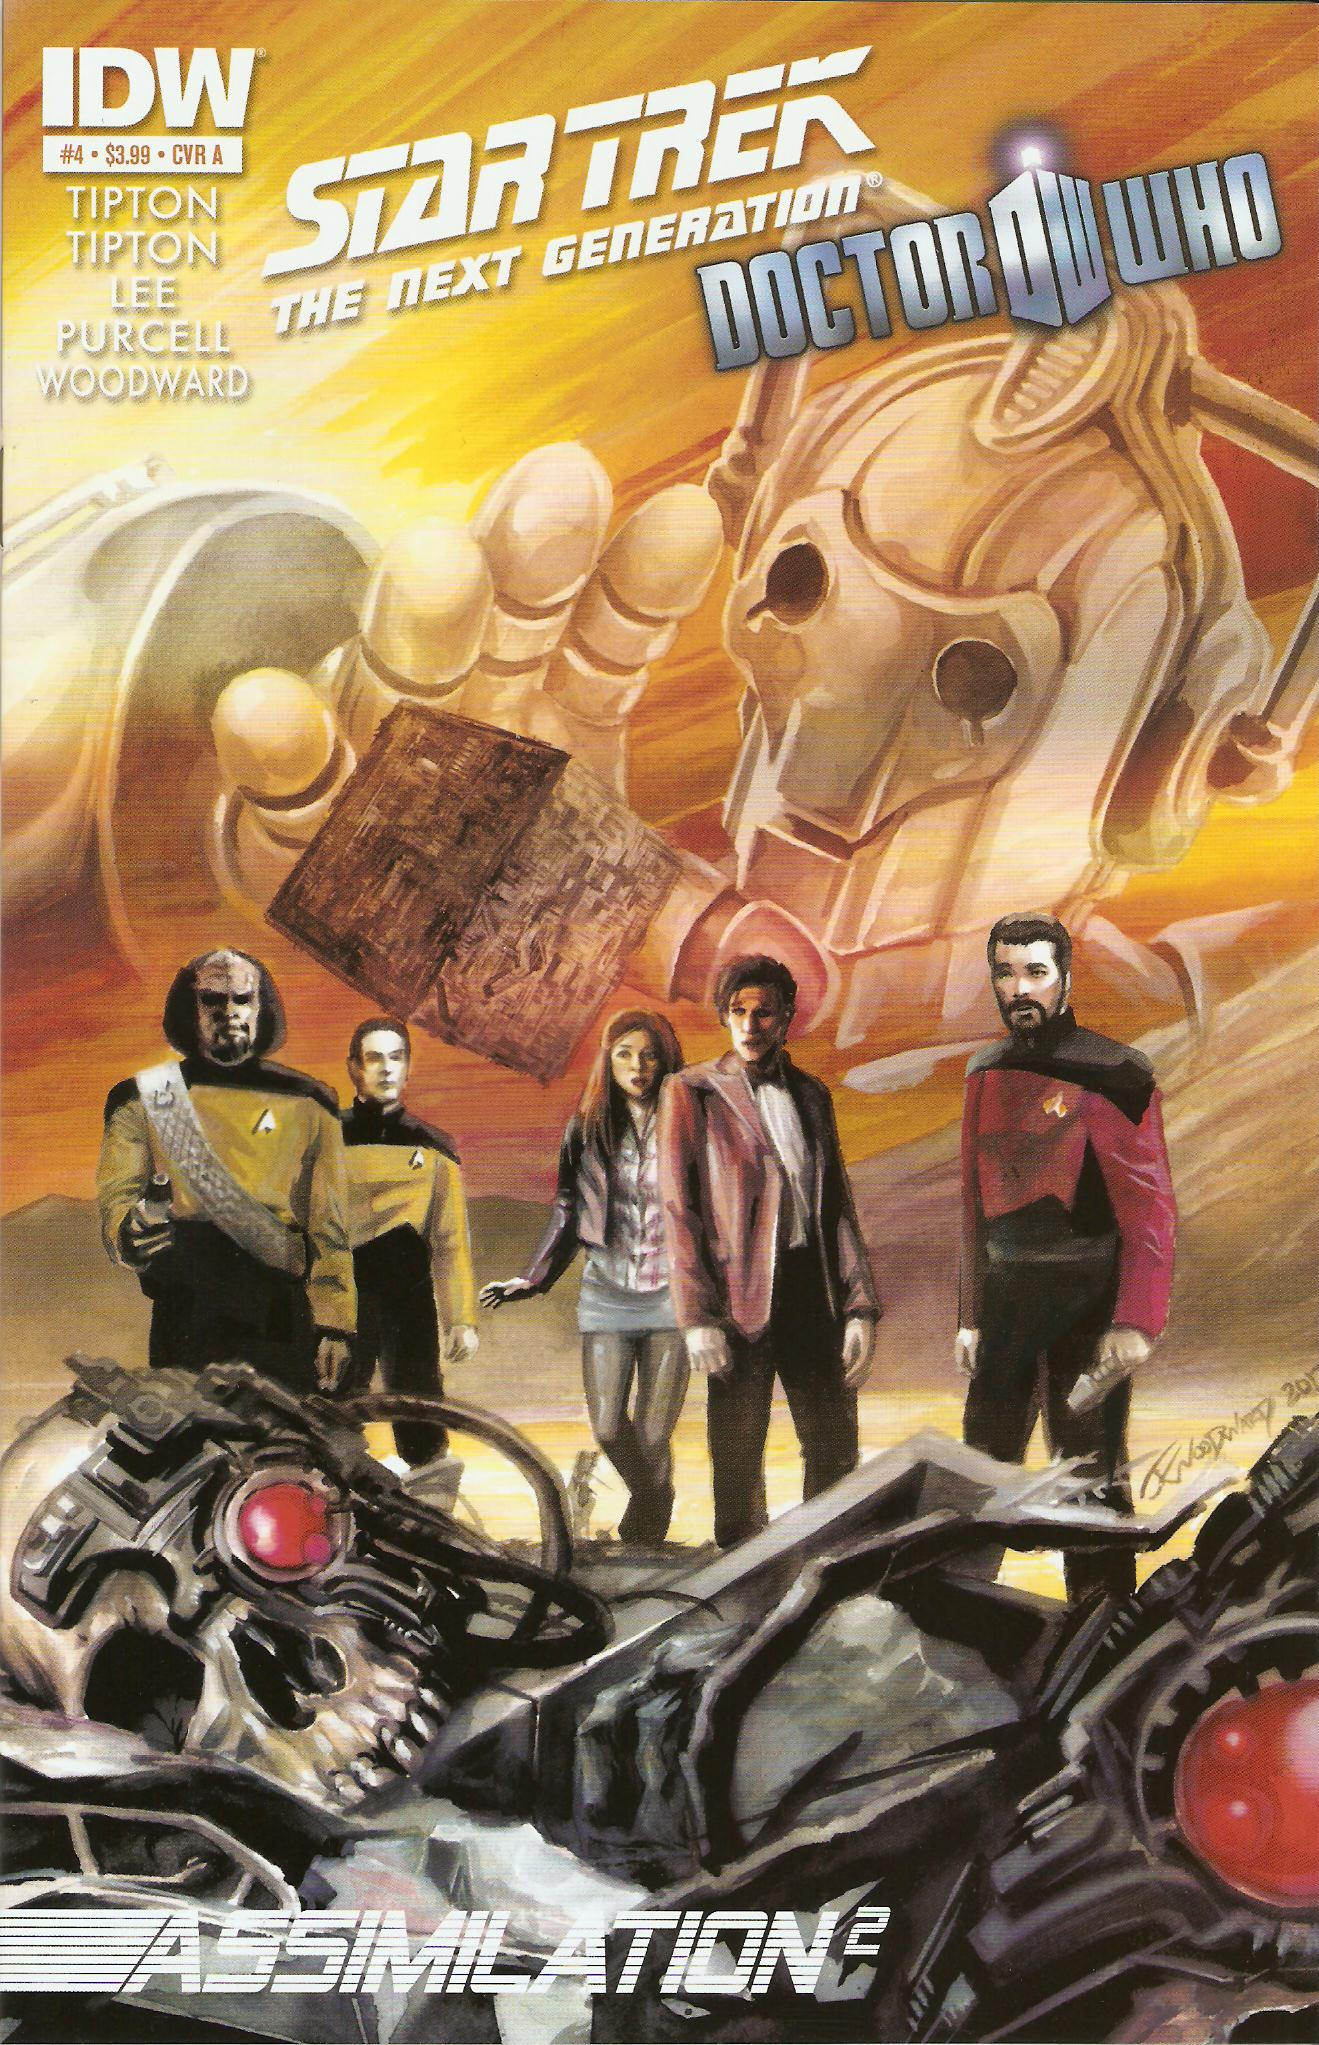 Star trek doctor who 4a